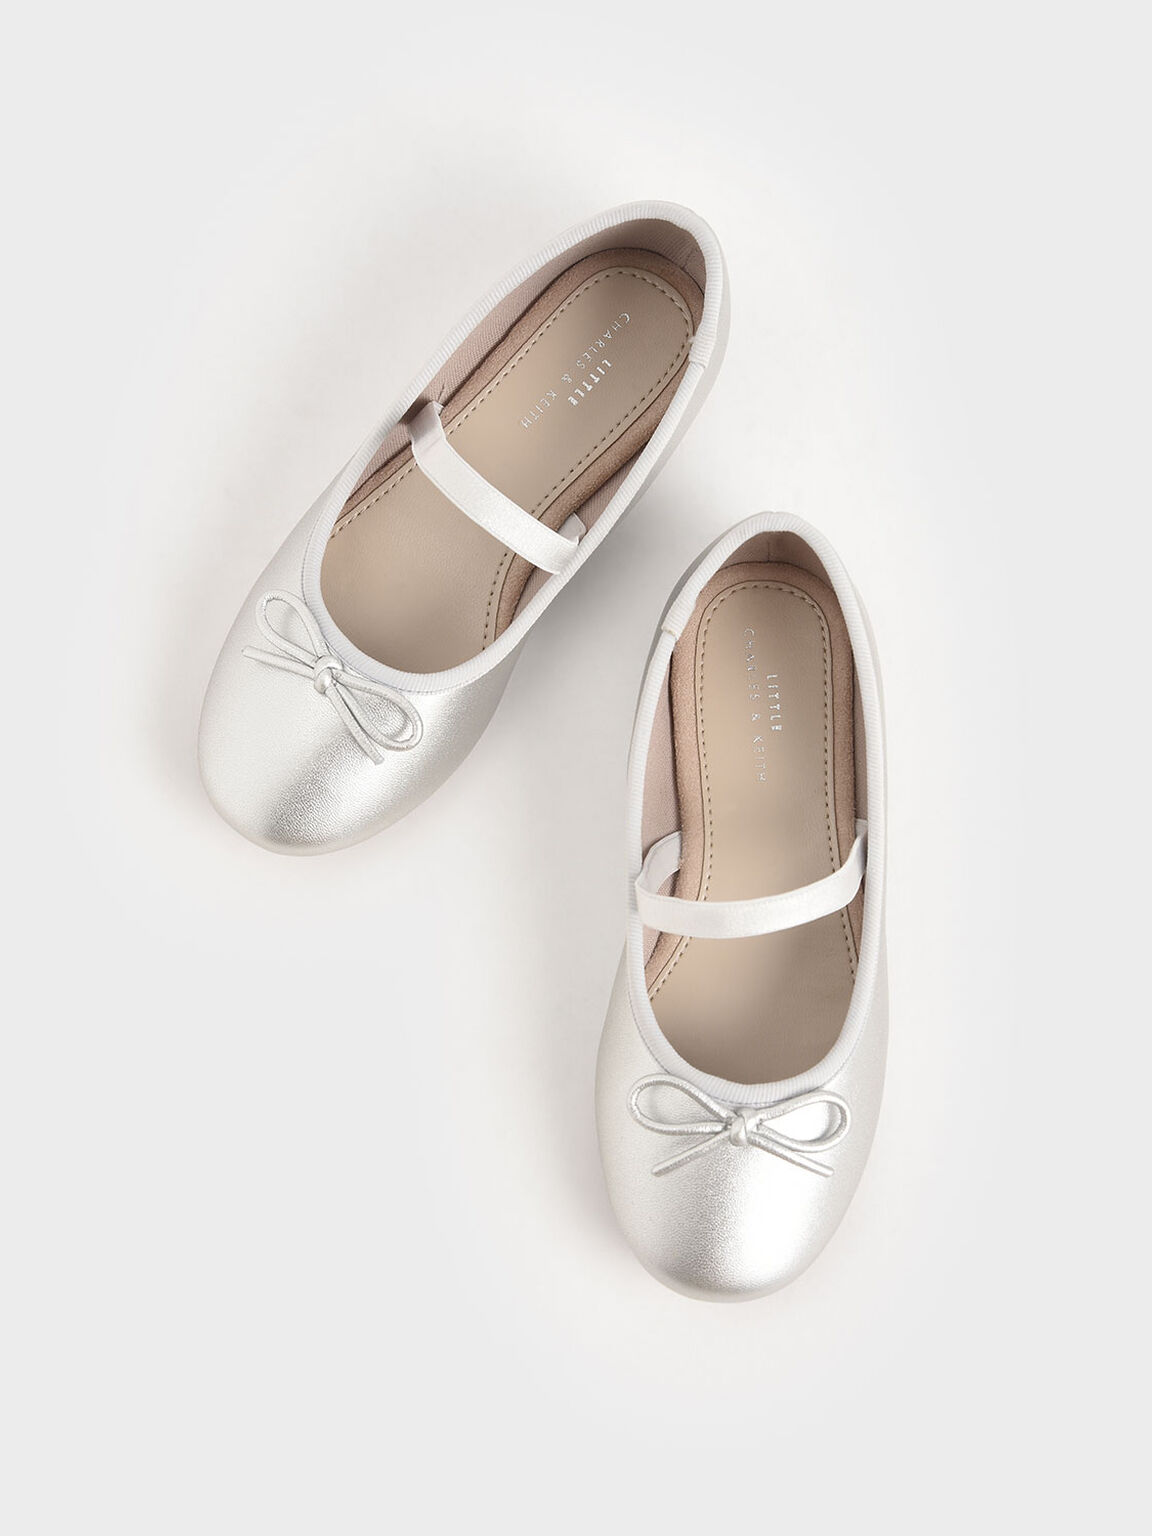 Girls' Metallic Bow Ballerina Flats, Silver, hi-res